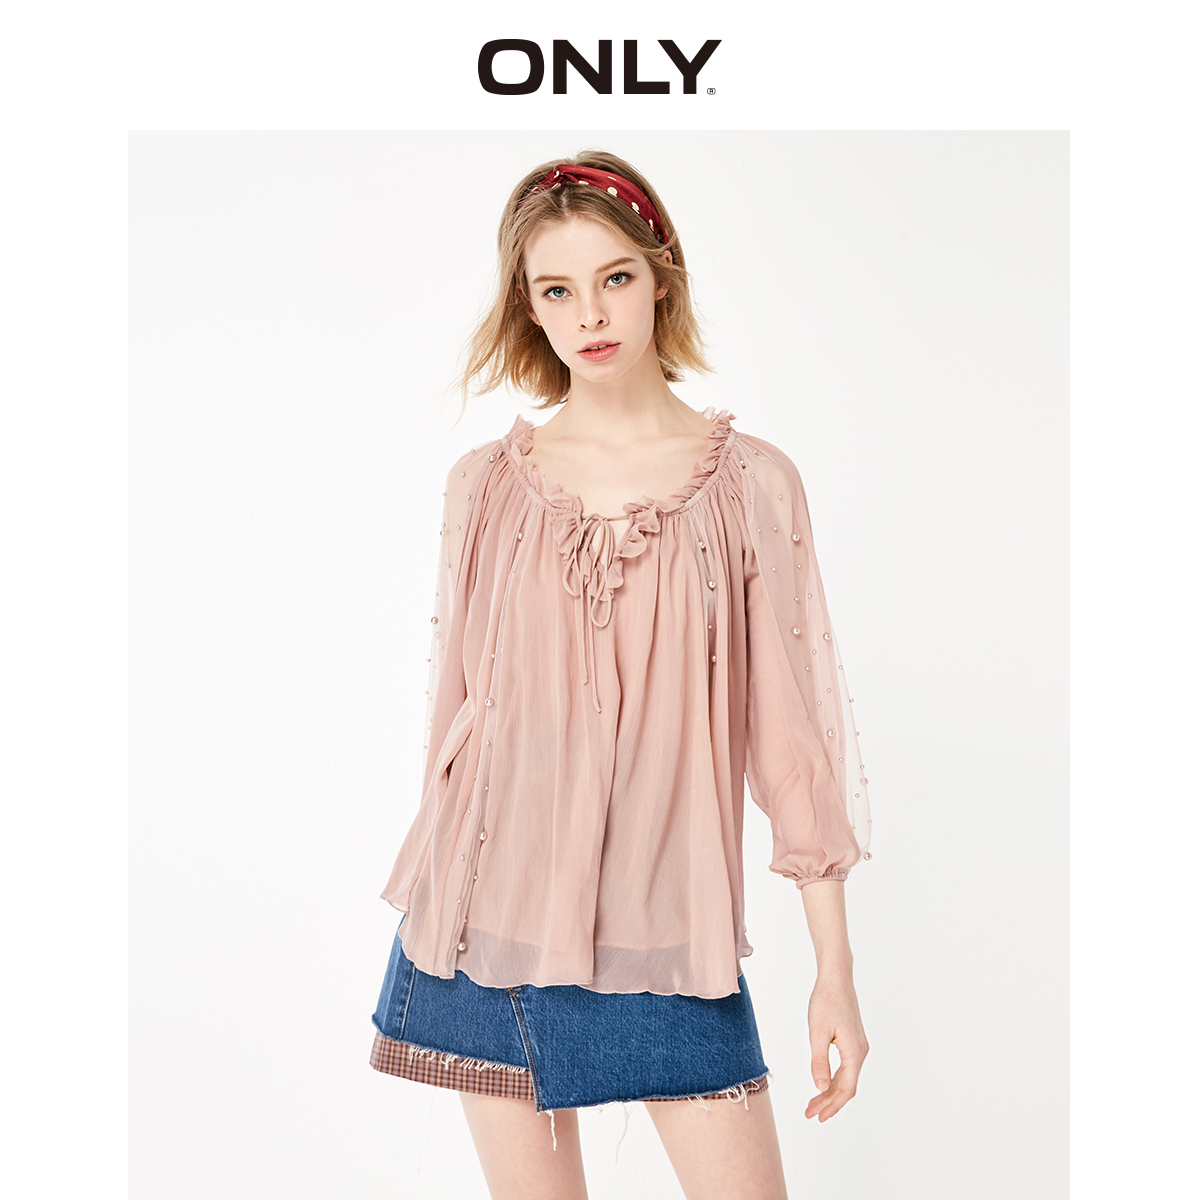 ONLY Women's Loose Fit Gauzy Lace-up Chiffon Shirt | 119151535